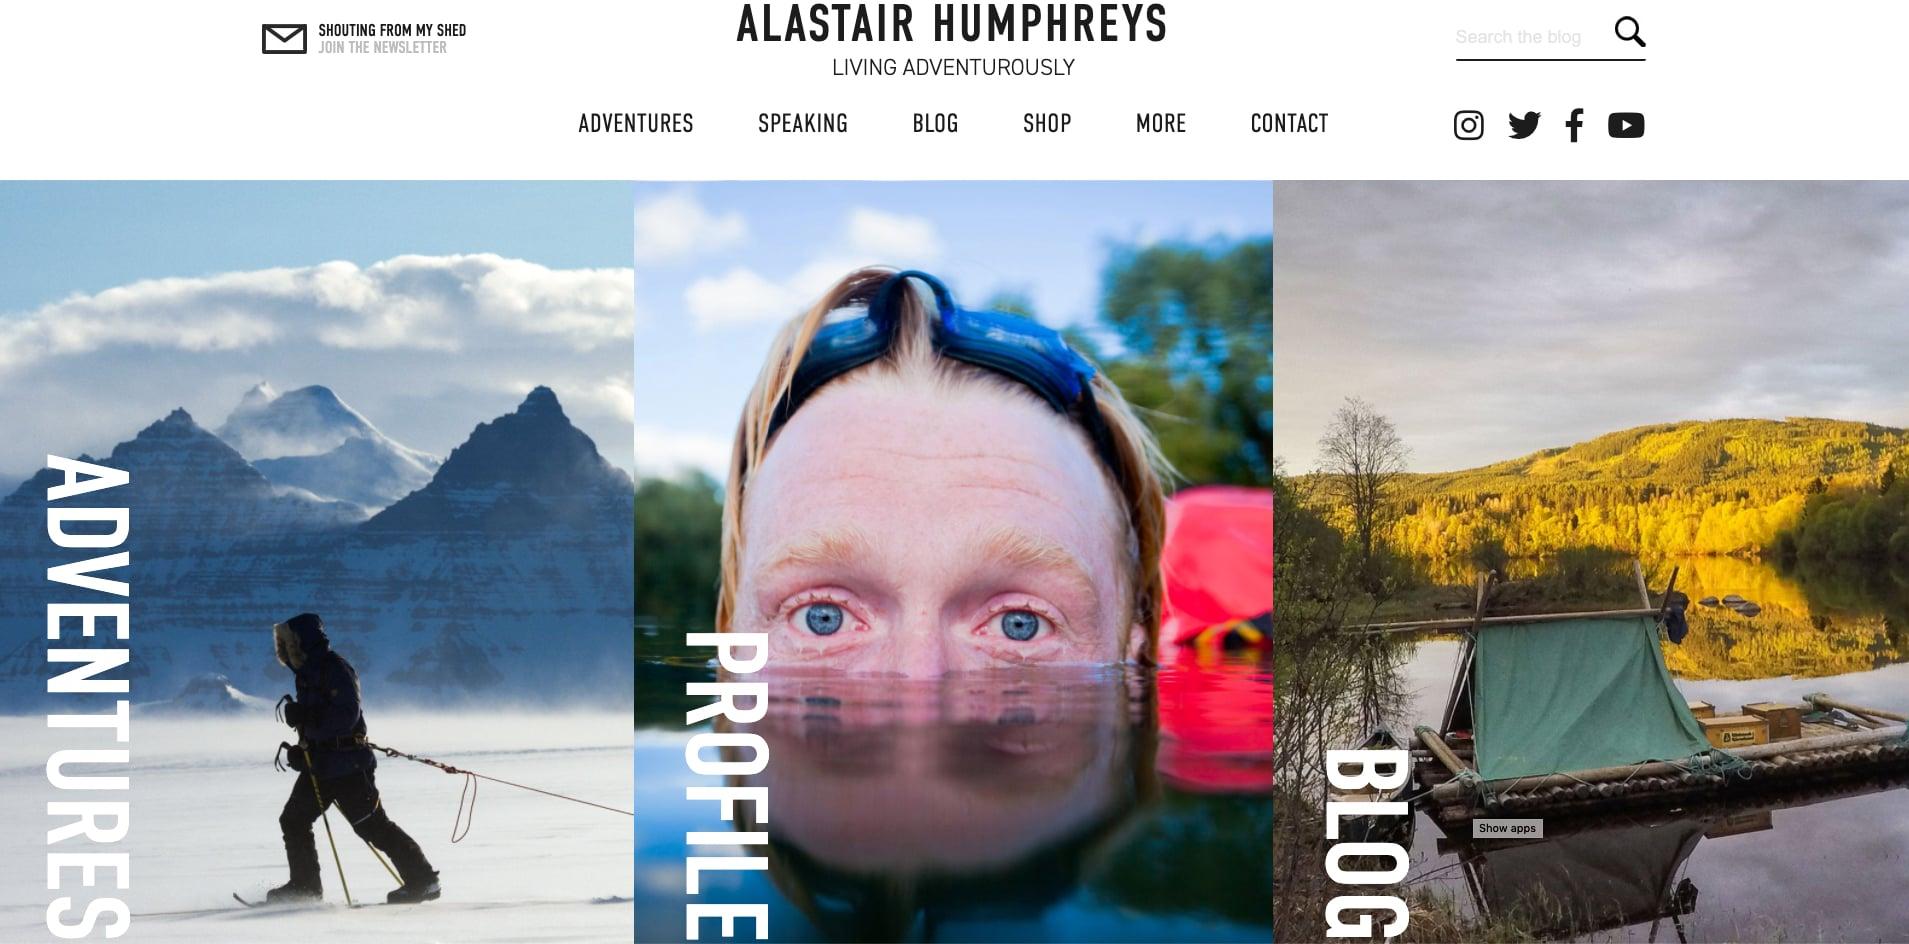 Alastair Humphreys website